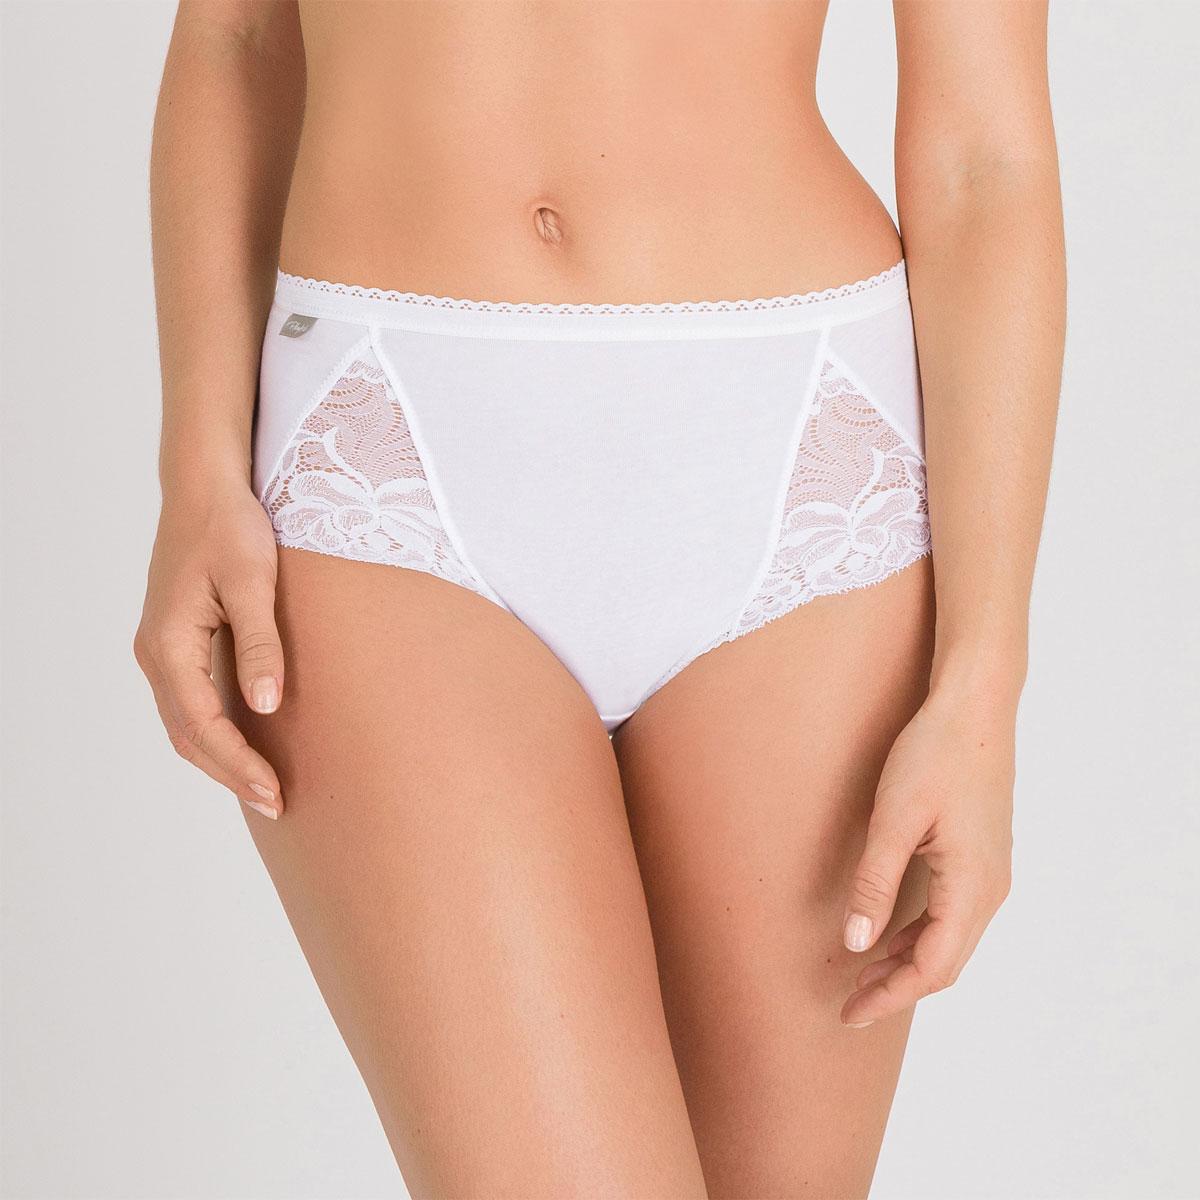 2 Culottes Midi blanches – Coton & Dentelle-PLAYTEX